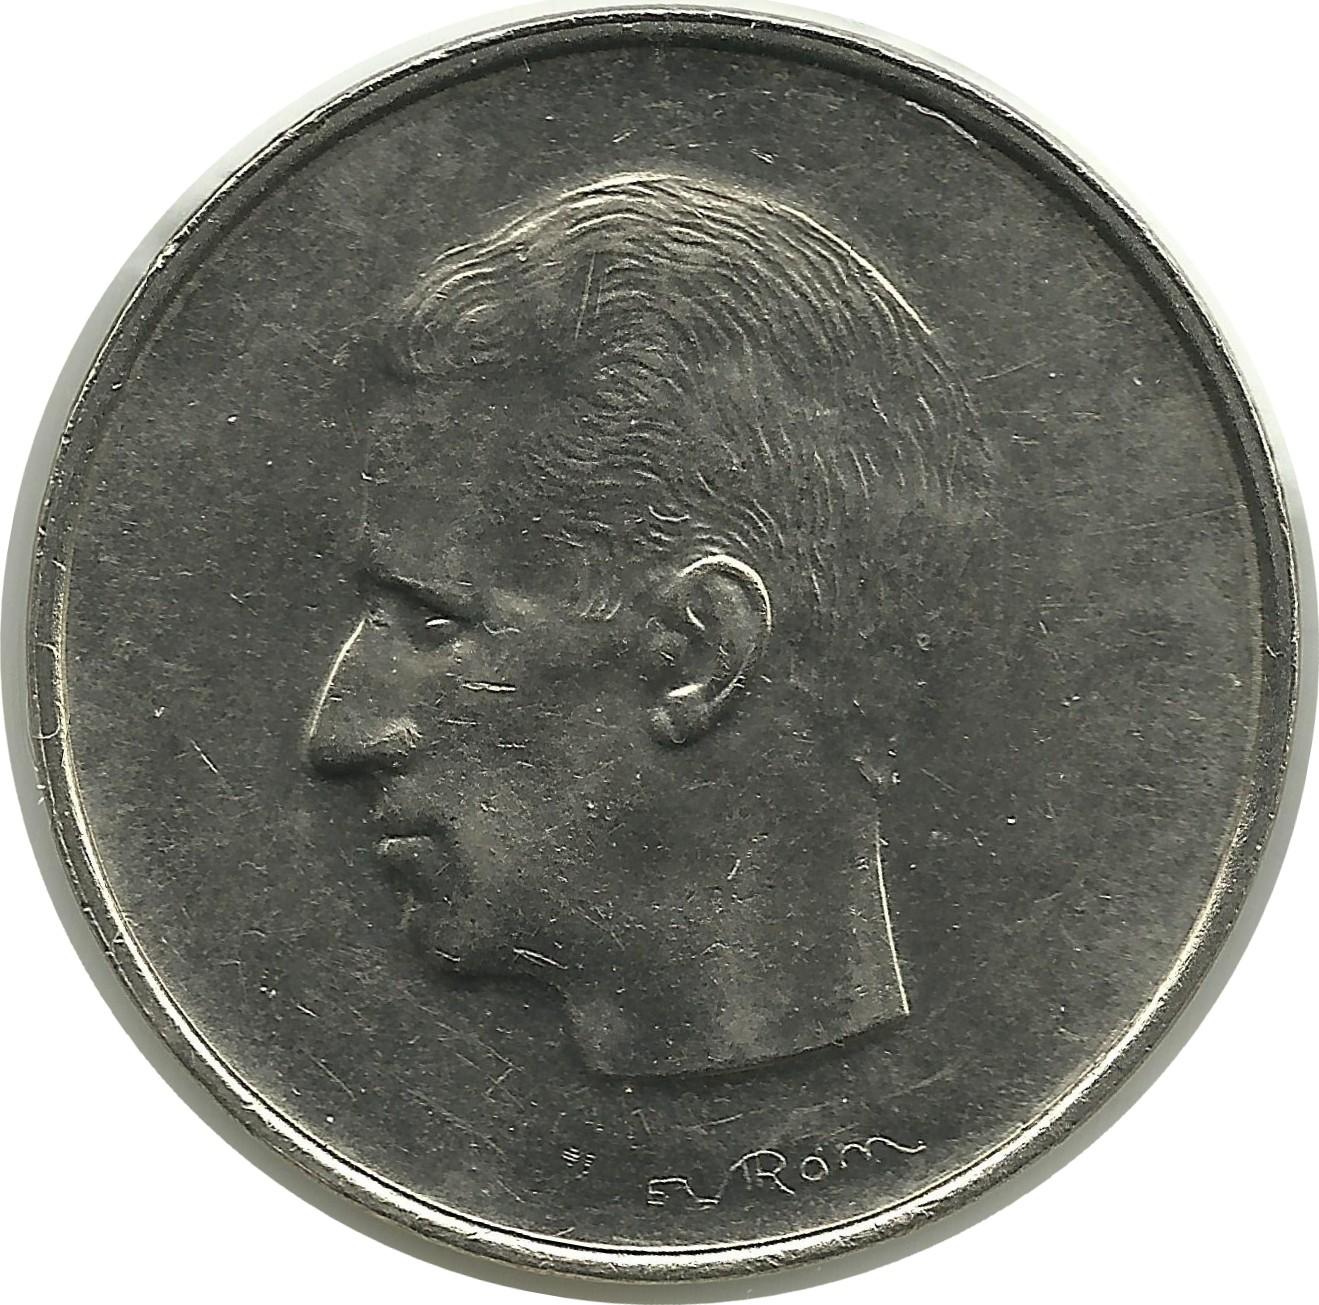 Belgium 10 Francs (1969-1979 Baudouin I)